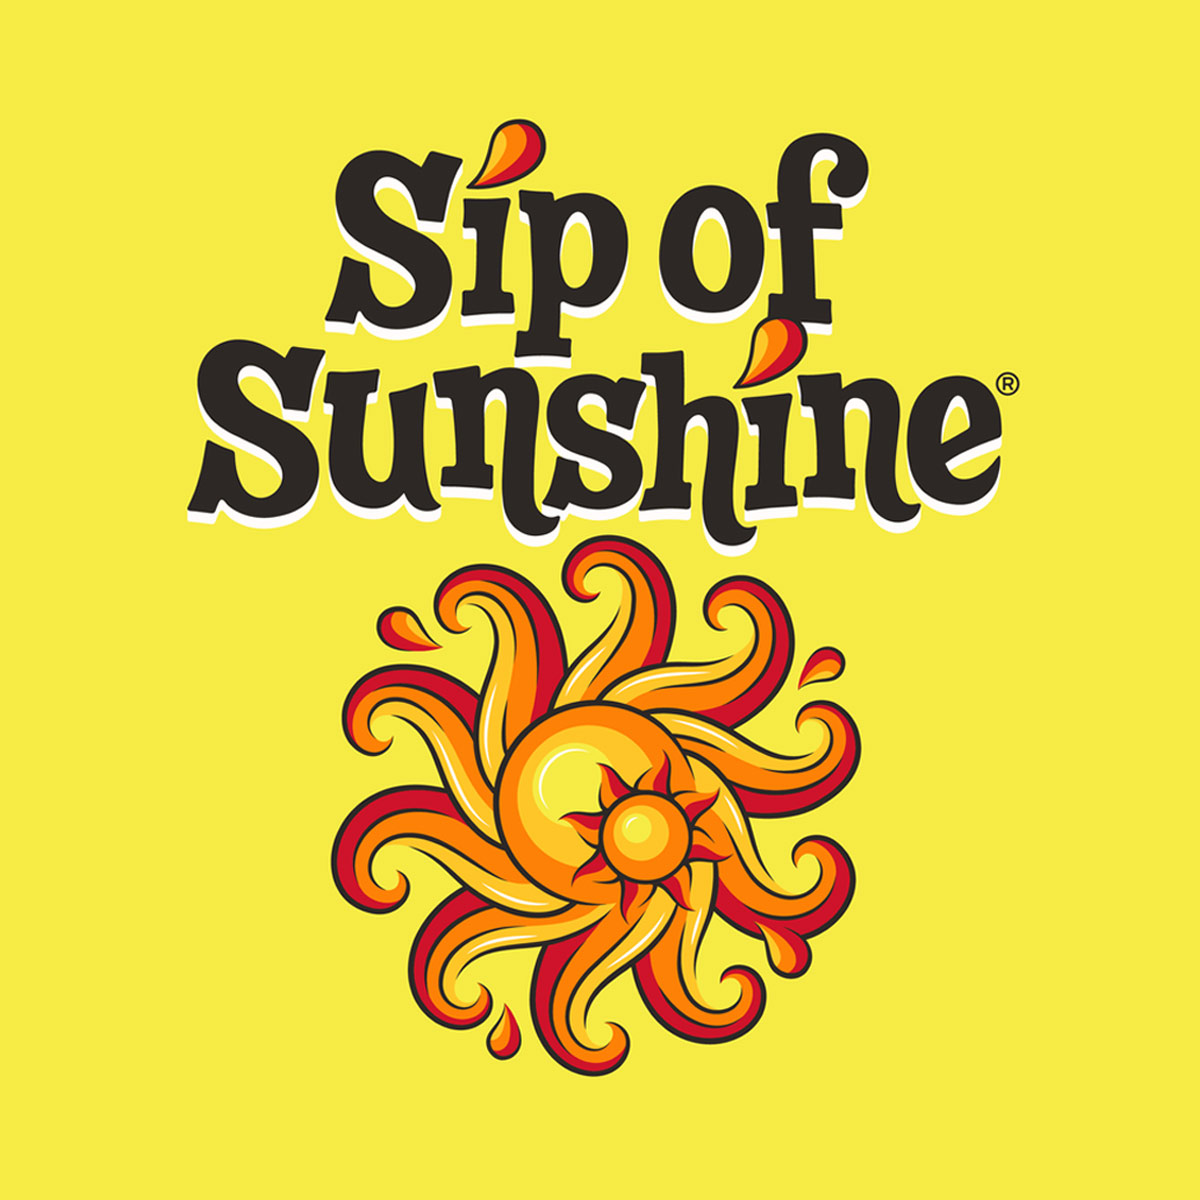 Sip of Sunshine - IPA